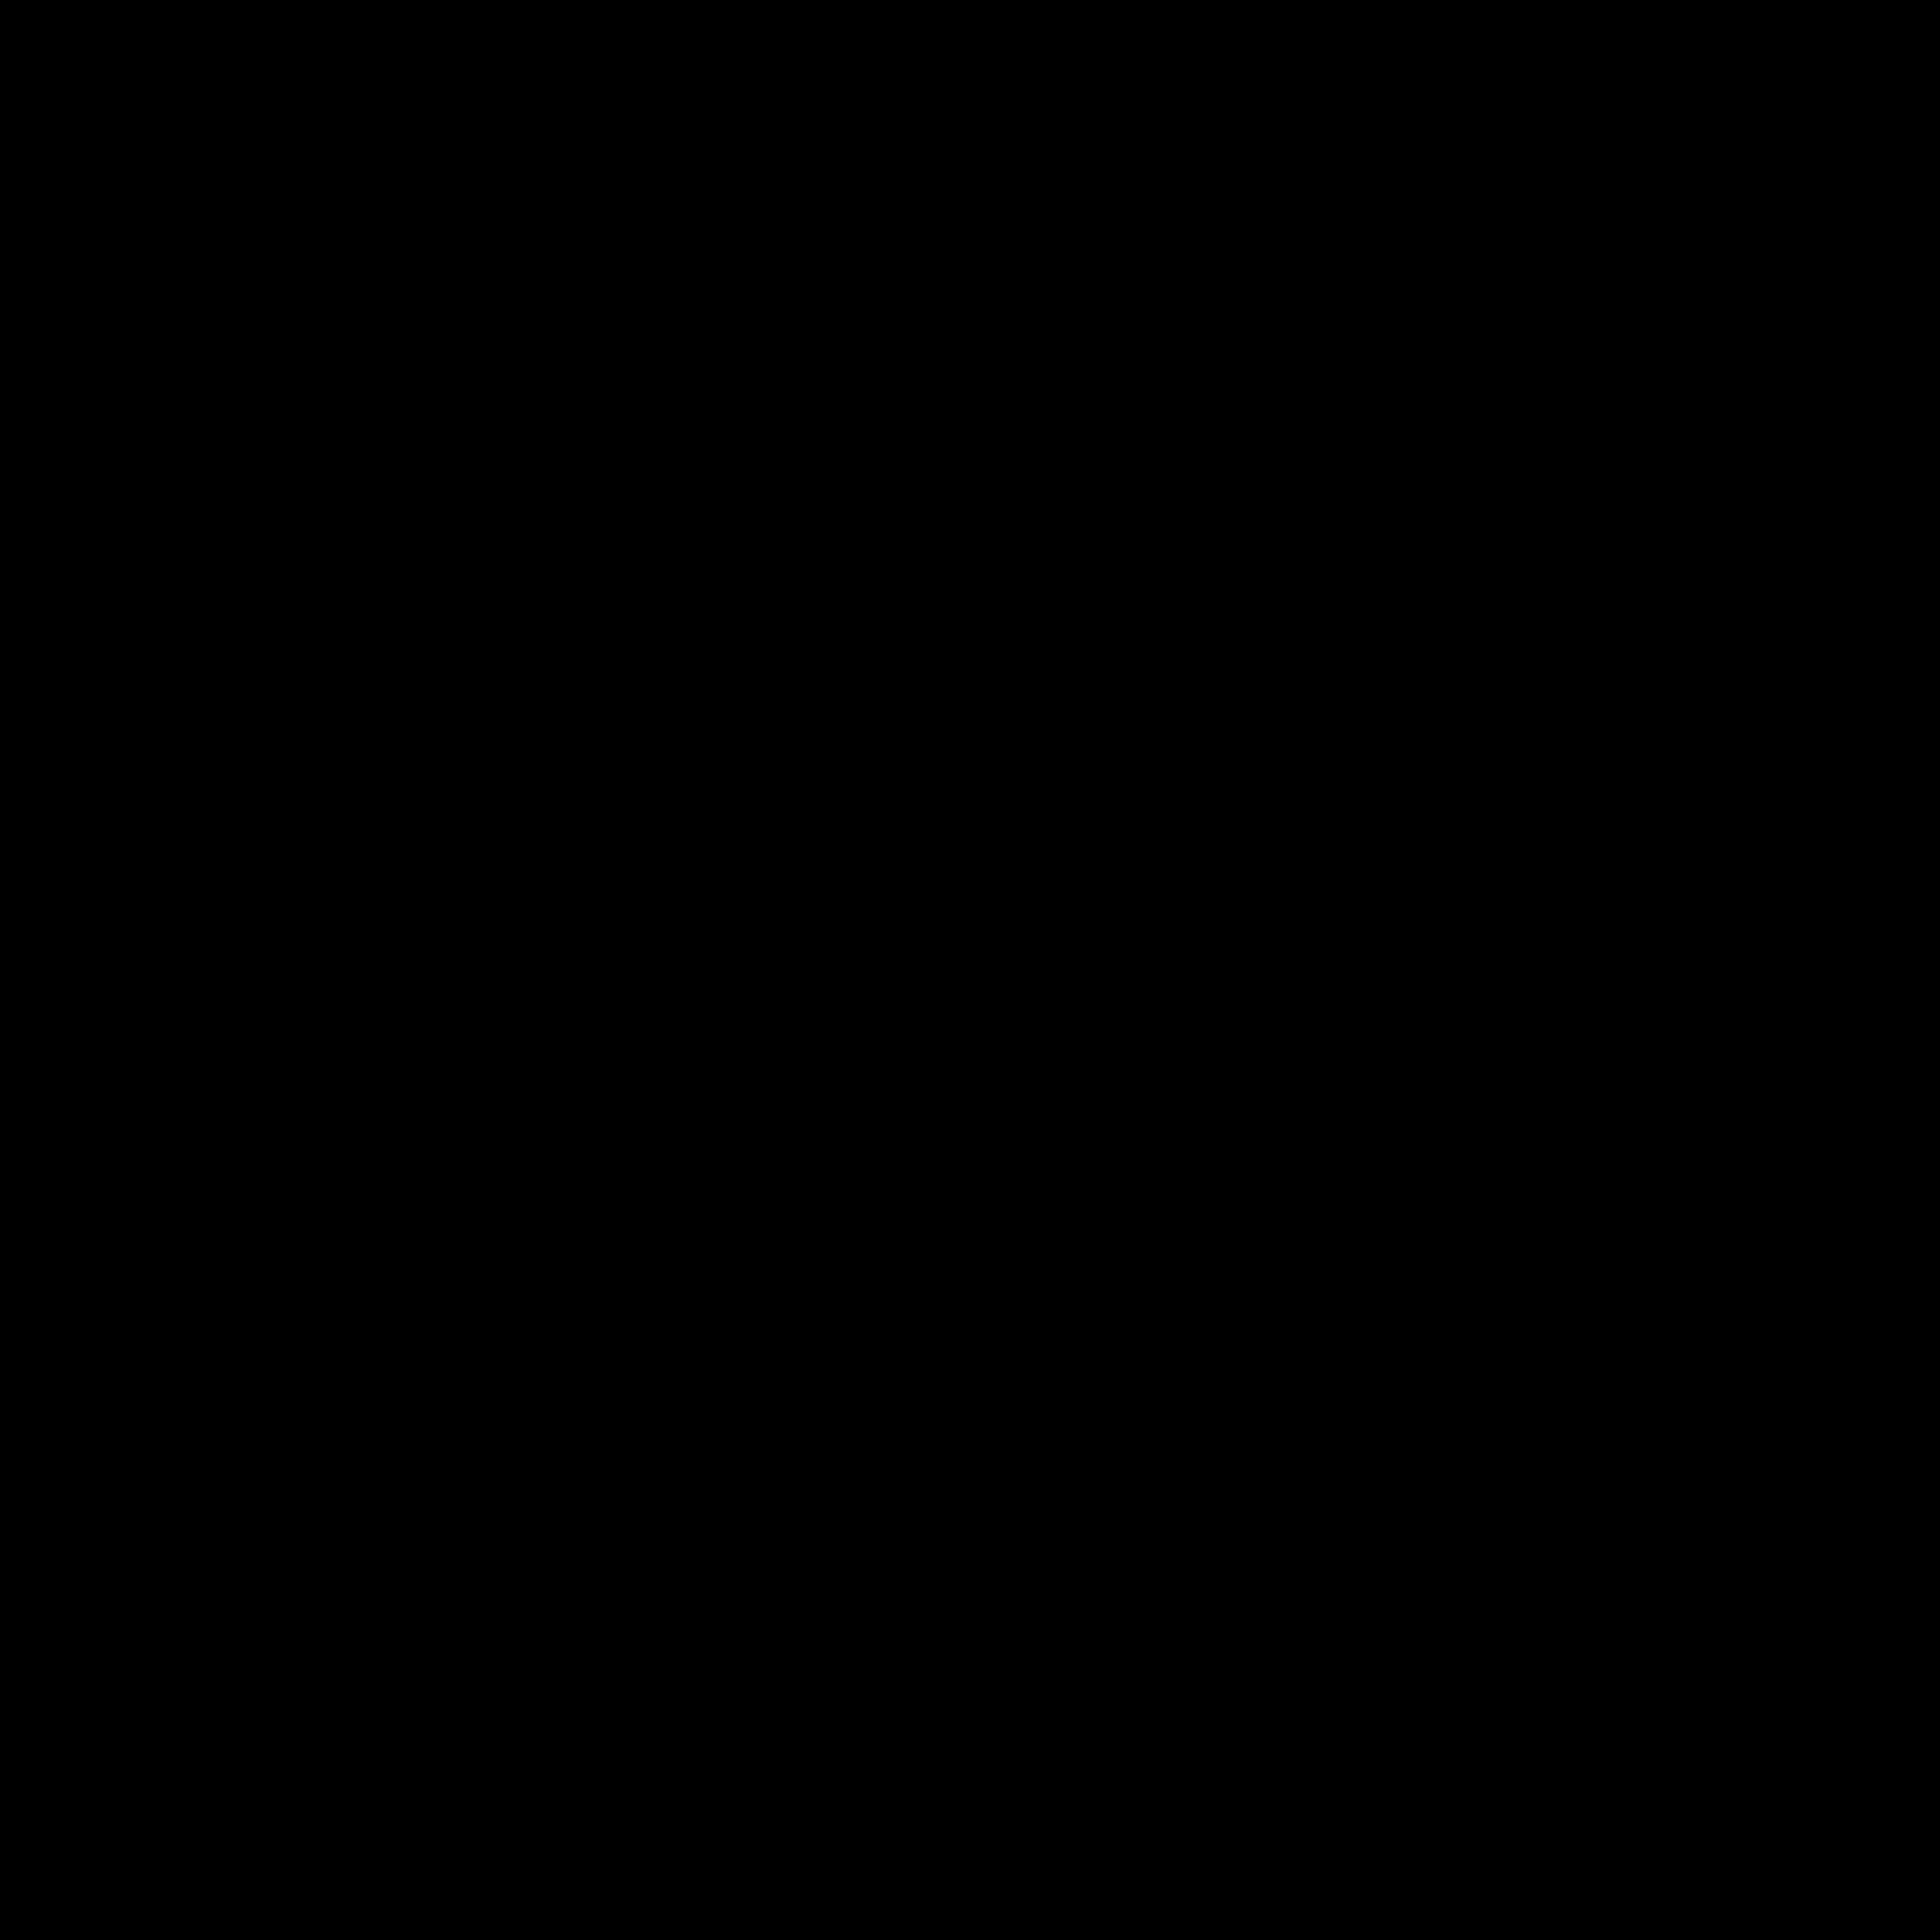 Aztec pumpkin monogram clipart transparent download Dotty Personalized Dinner Plate - Personalized or Monogram | BoutiqueMe transparent download